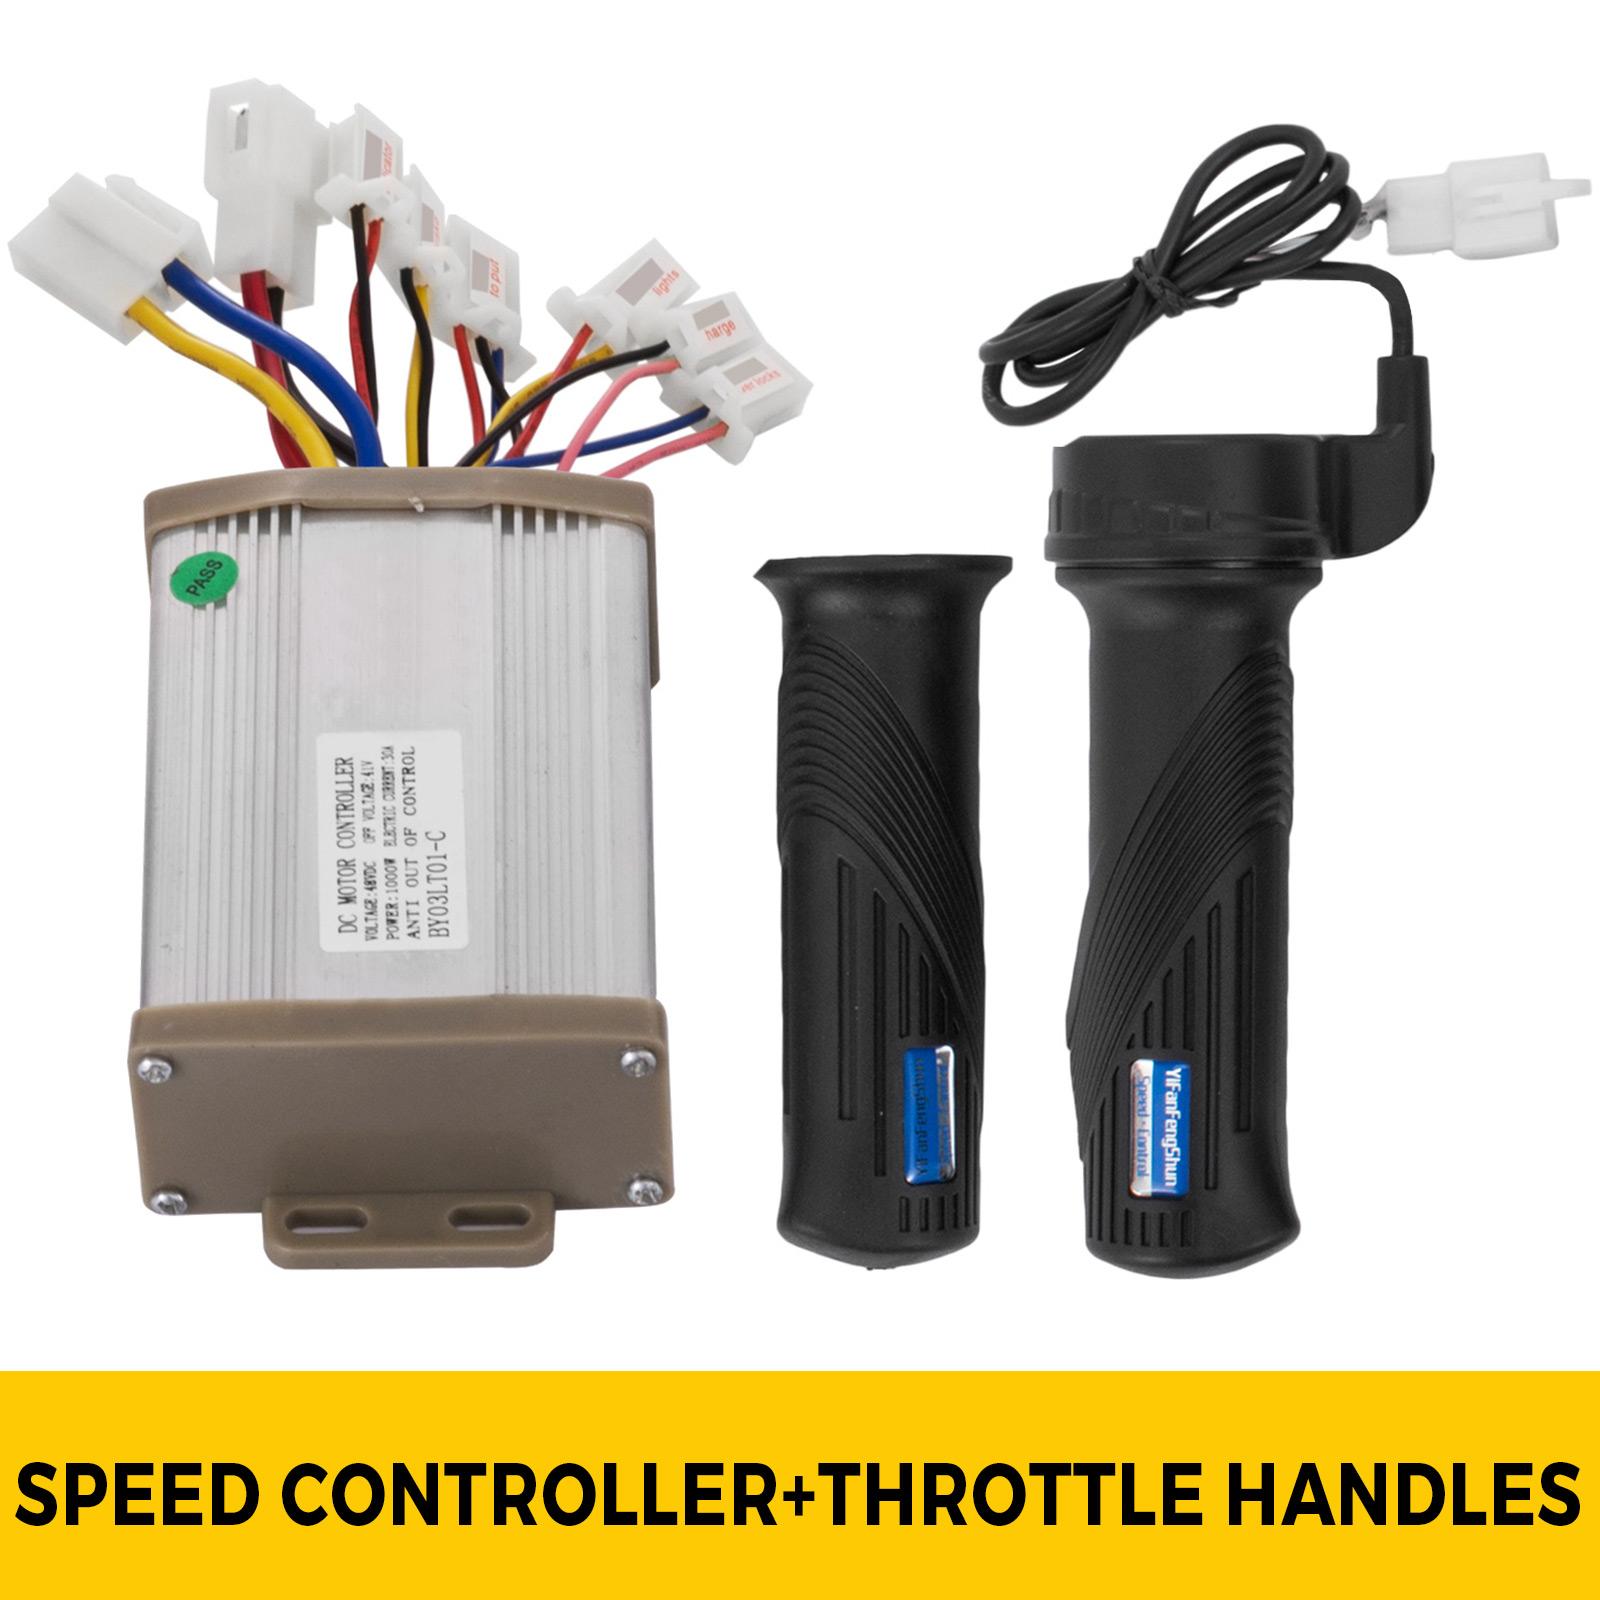 1800W-48V-DC-Brushless-Electric-Motor-Kit-f-Scooter-500-1800W-E-Bike-Go-Kart thumbnail 53